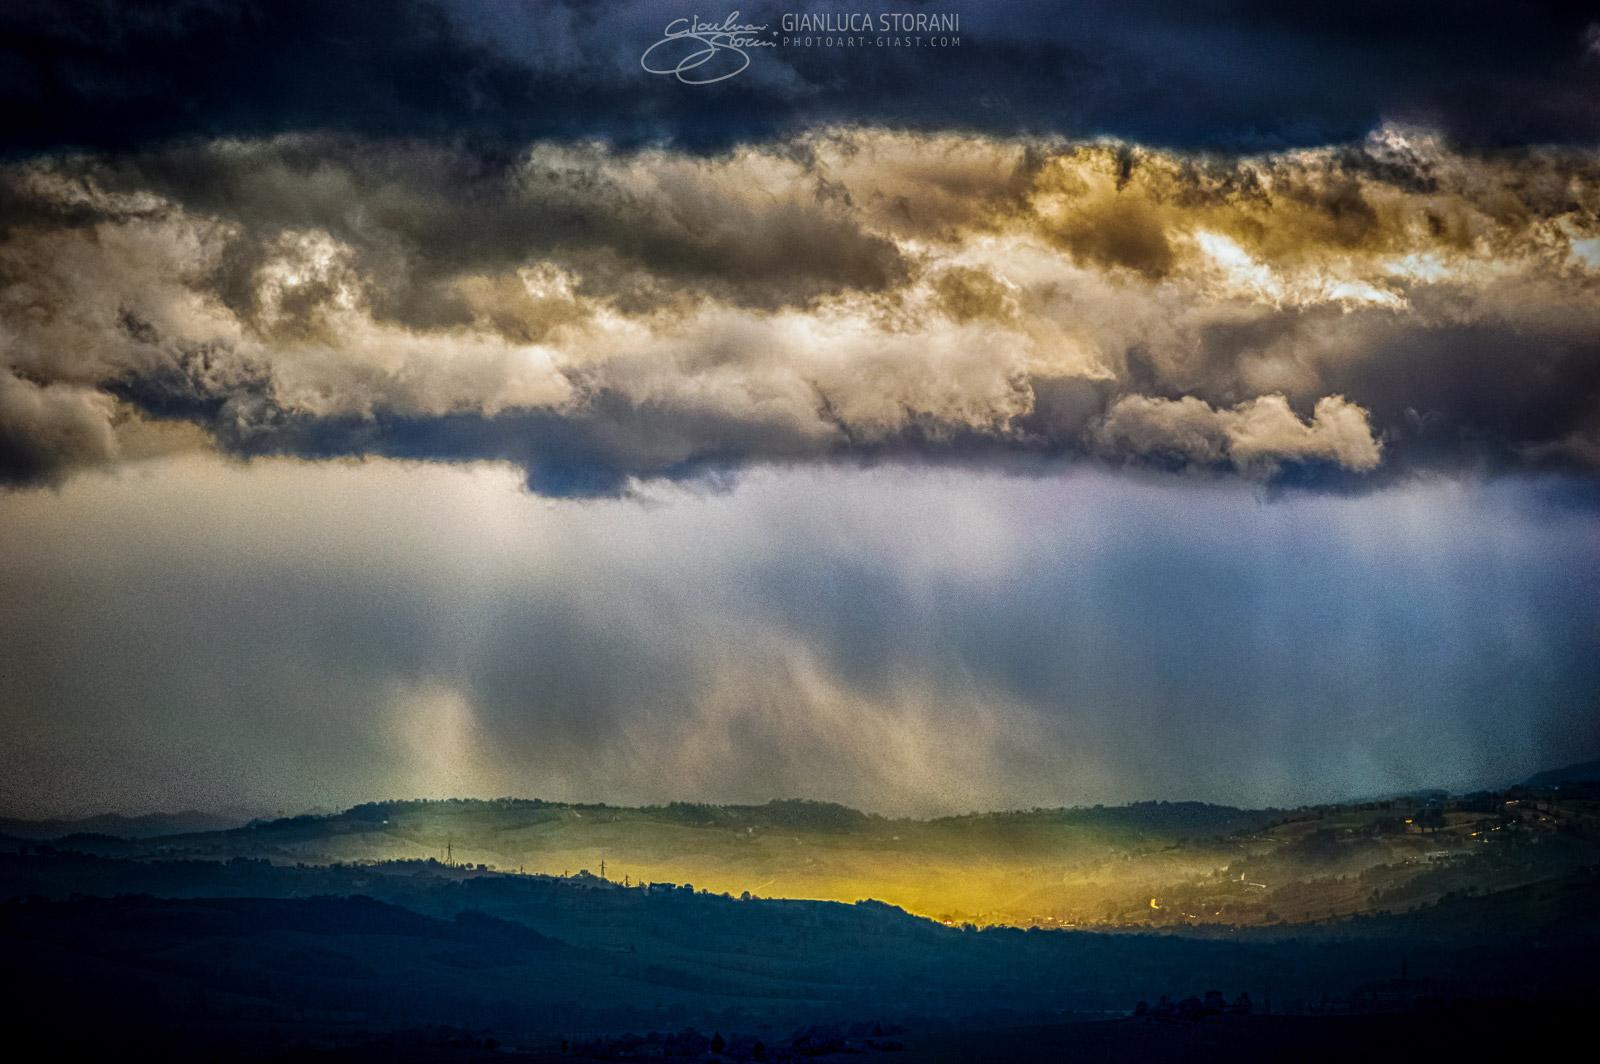 Raggi dorati nel buio - Gianluca Storani Photo Art (ID: 2-1385)